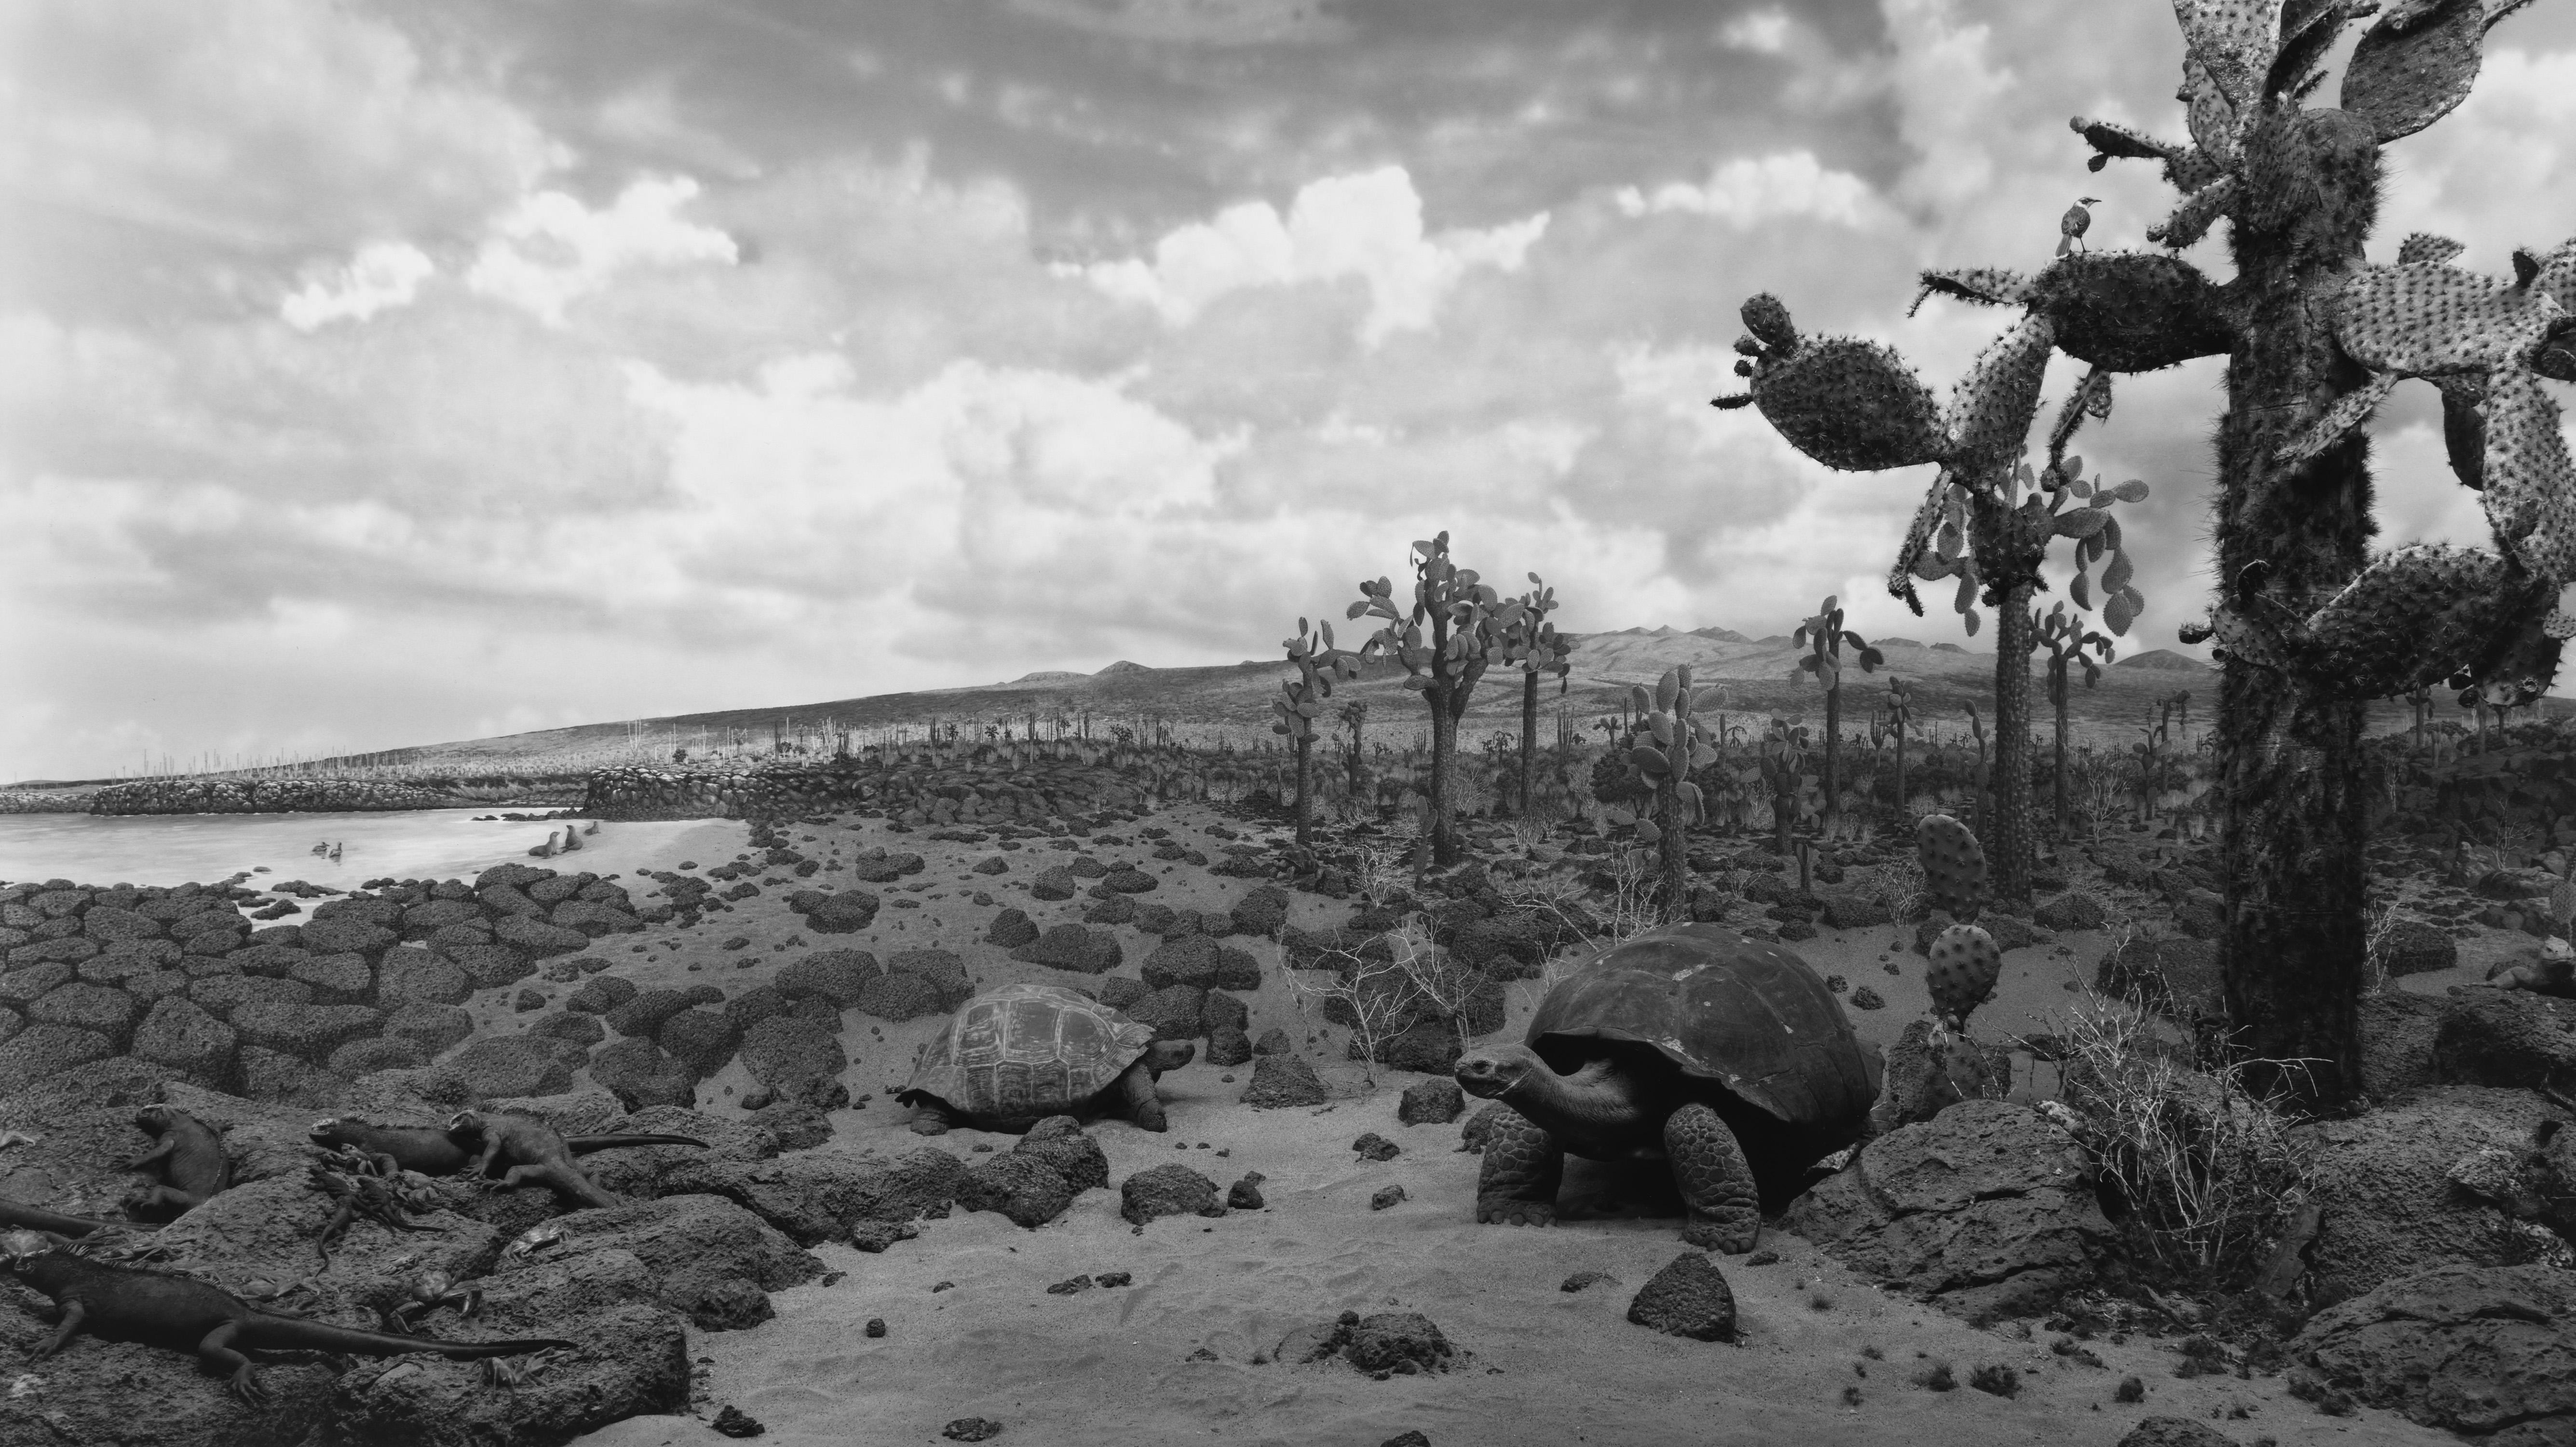 Hiroshi Sugimoto,  Galapagos, 1980 -¬ Hiroshi Sugimoto, courtesy Pace Gallery. Making Nature